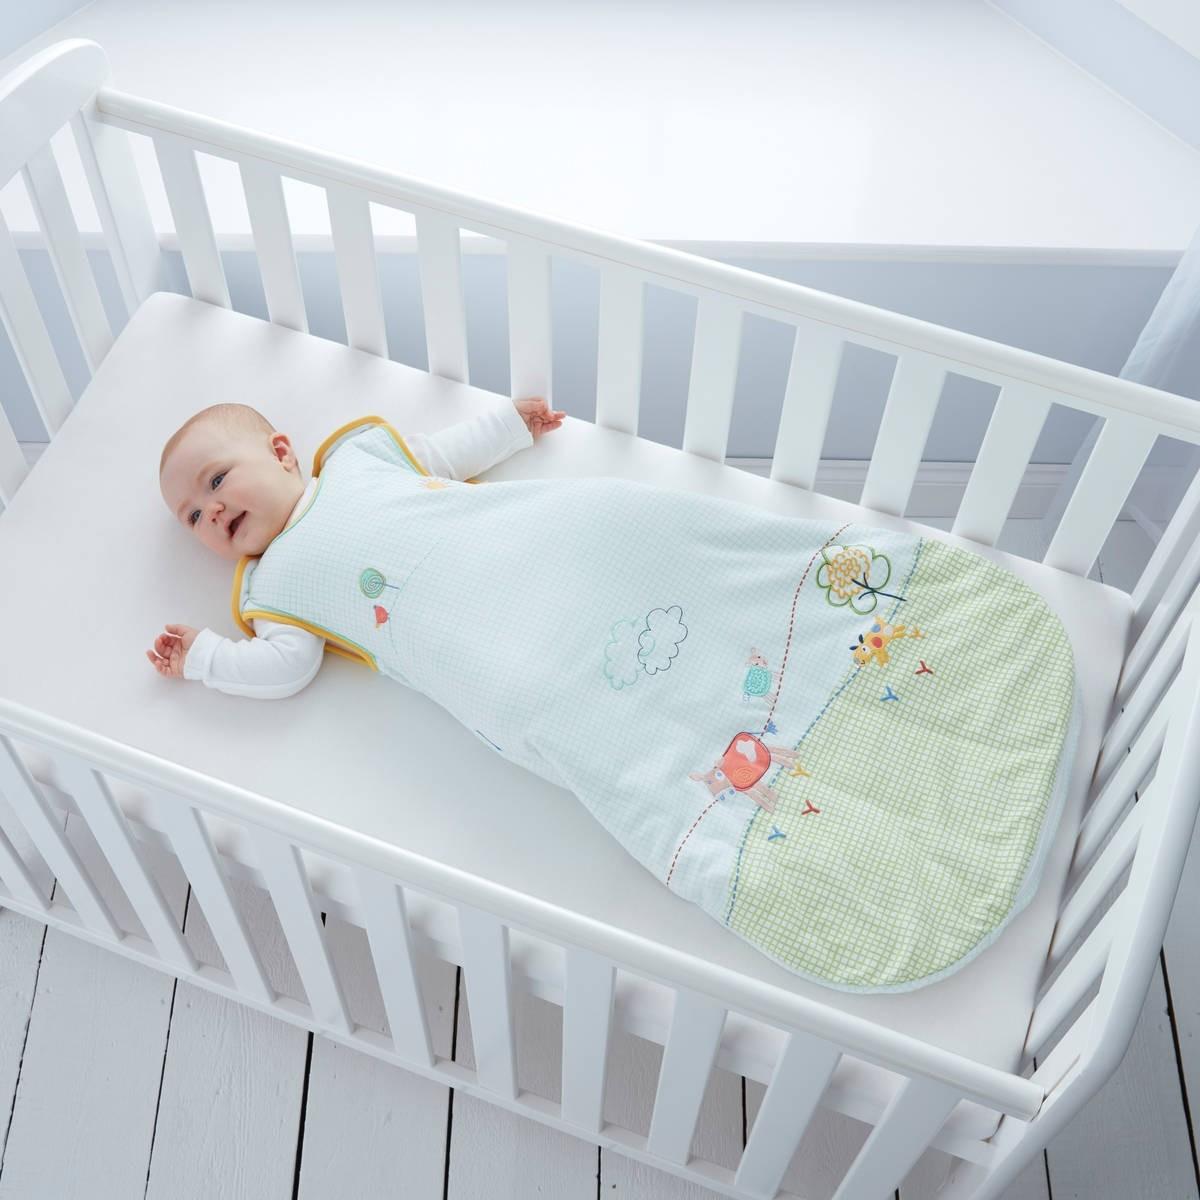 74ee9f04736c Μωρο :: Ύπνος :: Grobag Υπνόσακοι :: Grobag Υπνόσακοι 6 - 18 μηνών ...